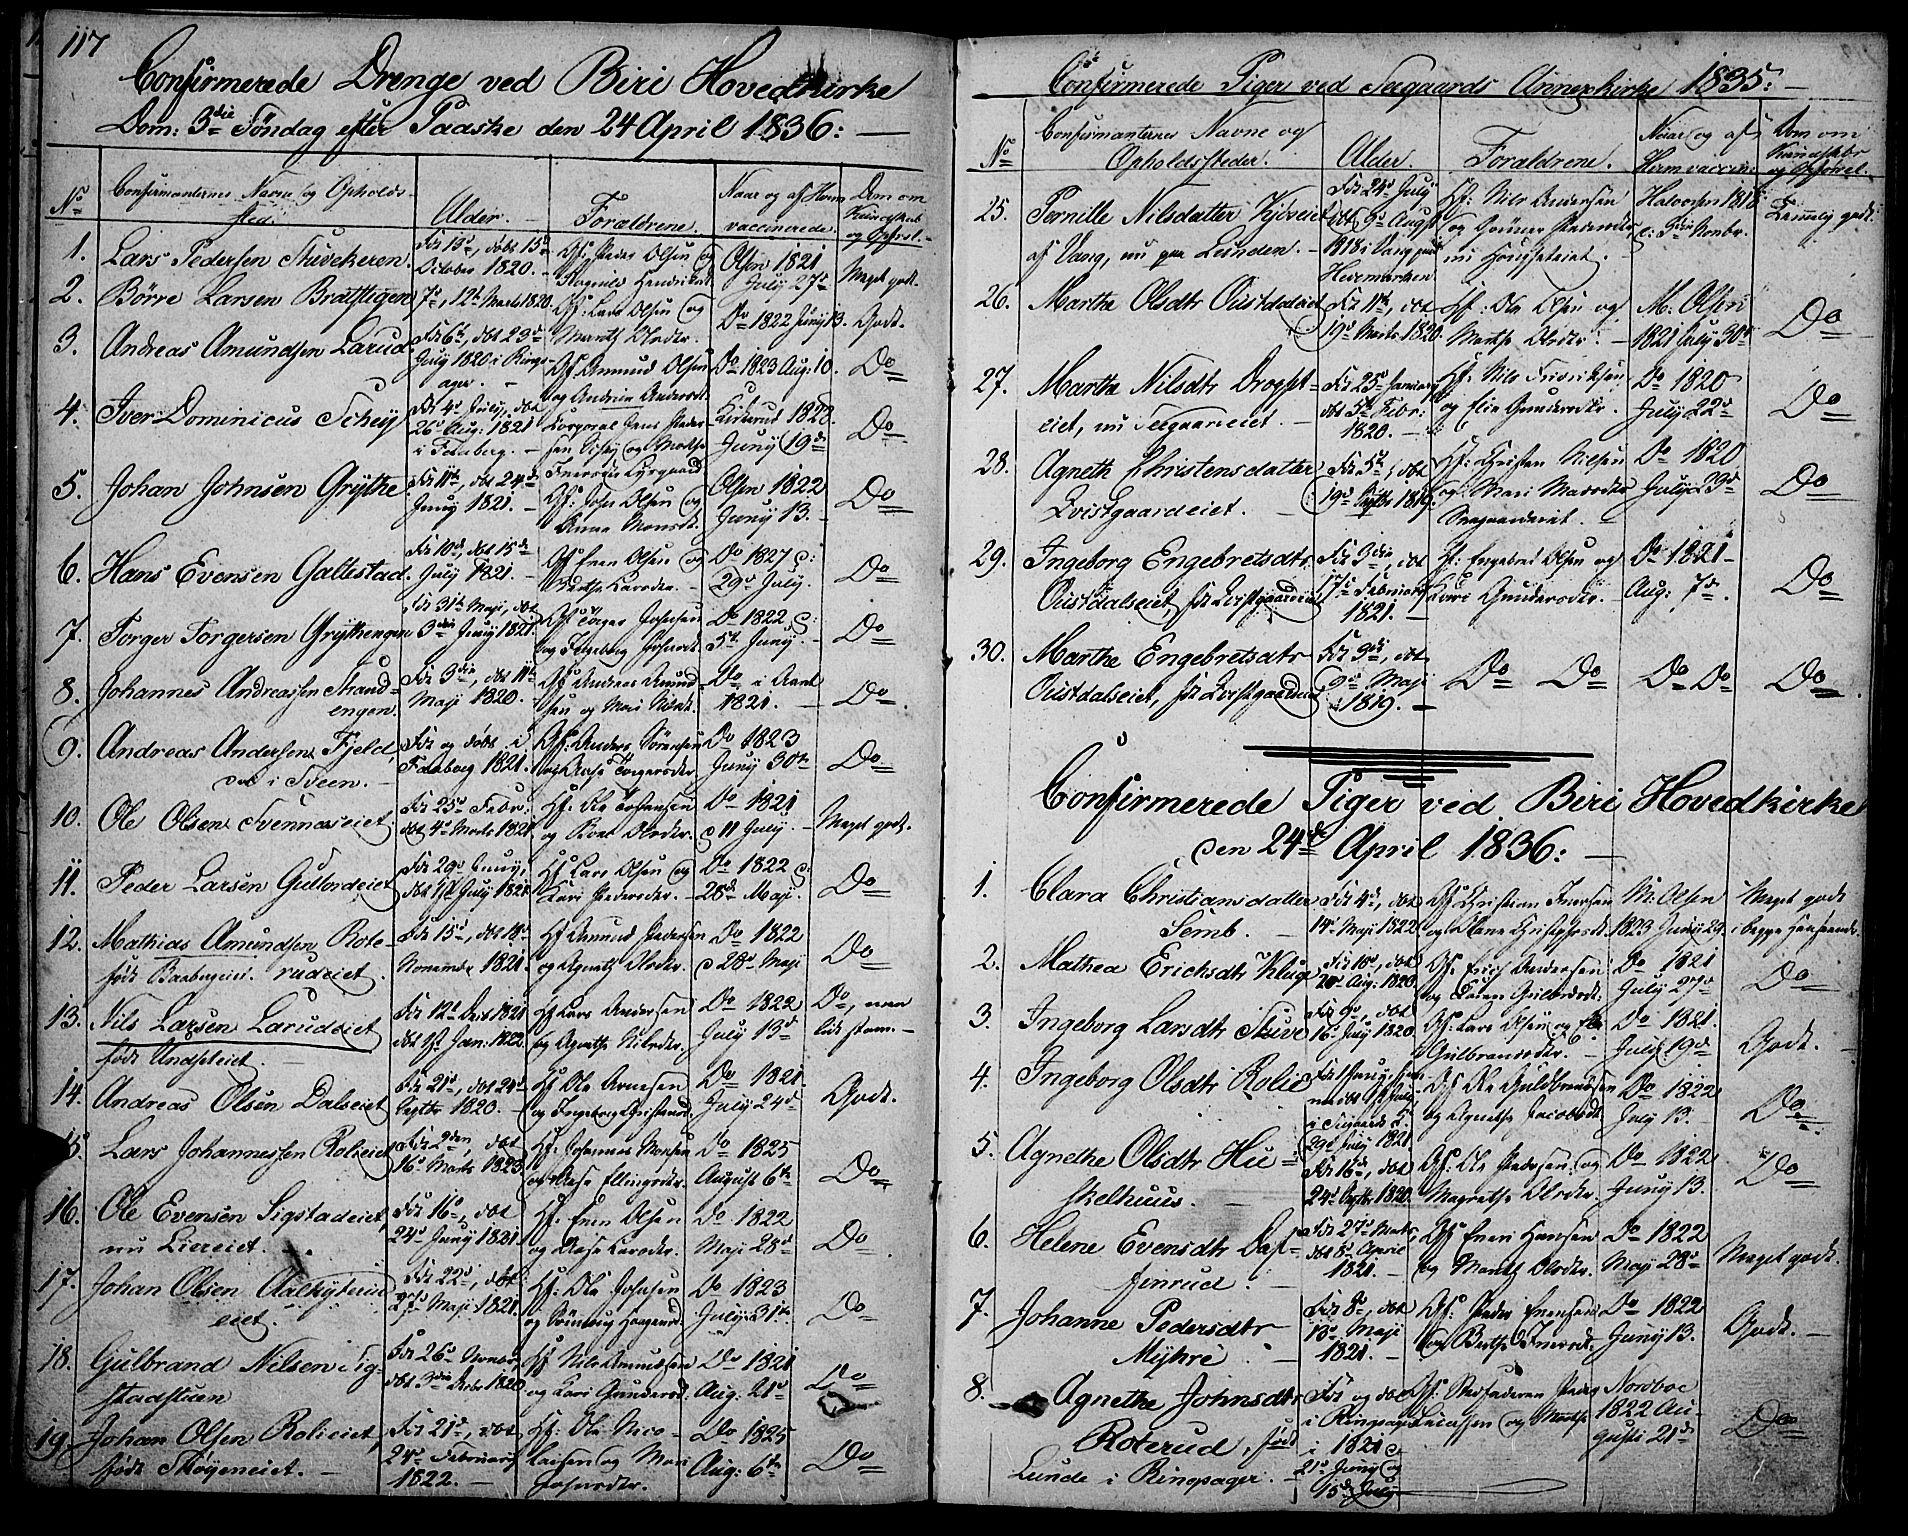 SAH, Biri prestekontor, Ministerialbok nr. 4, 1829-1842, s. 117